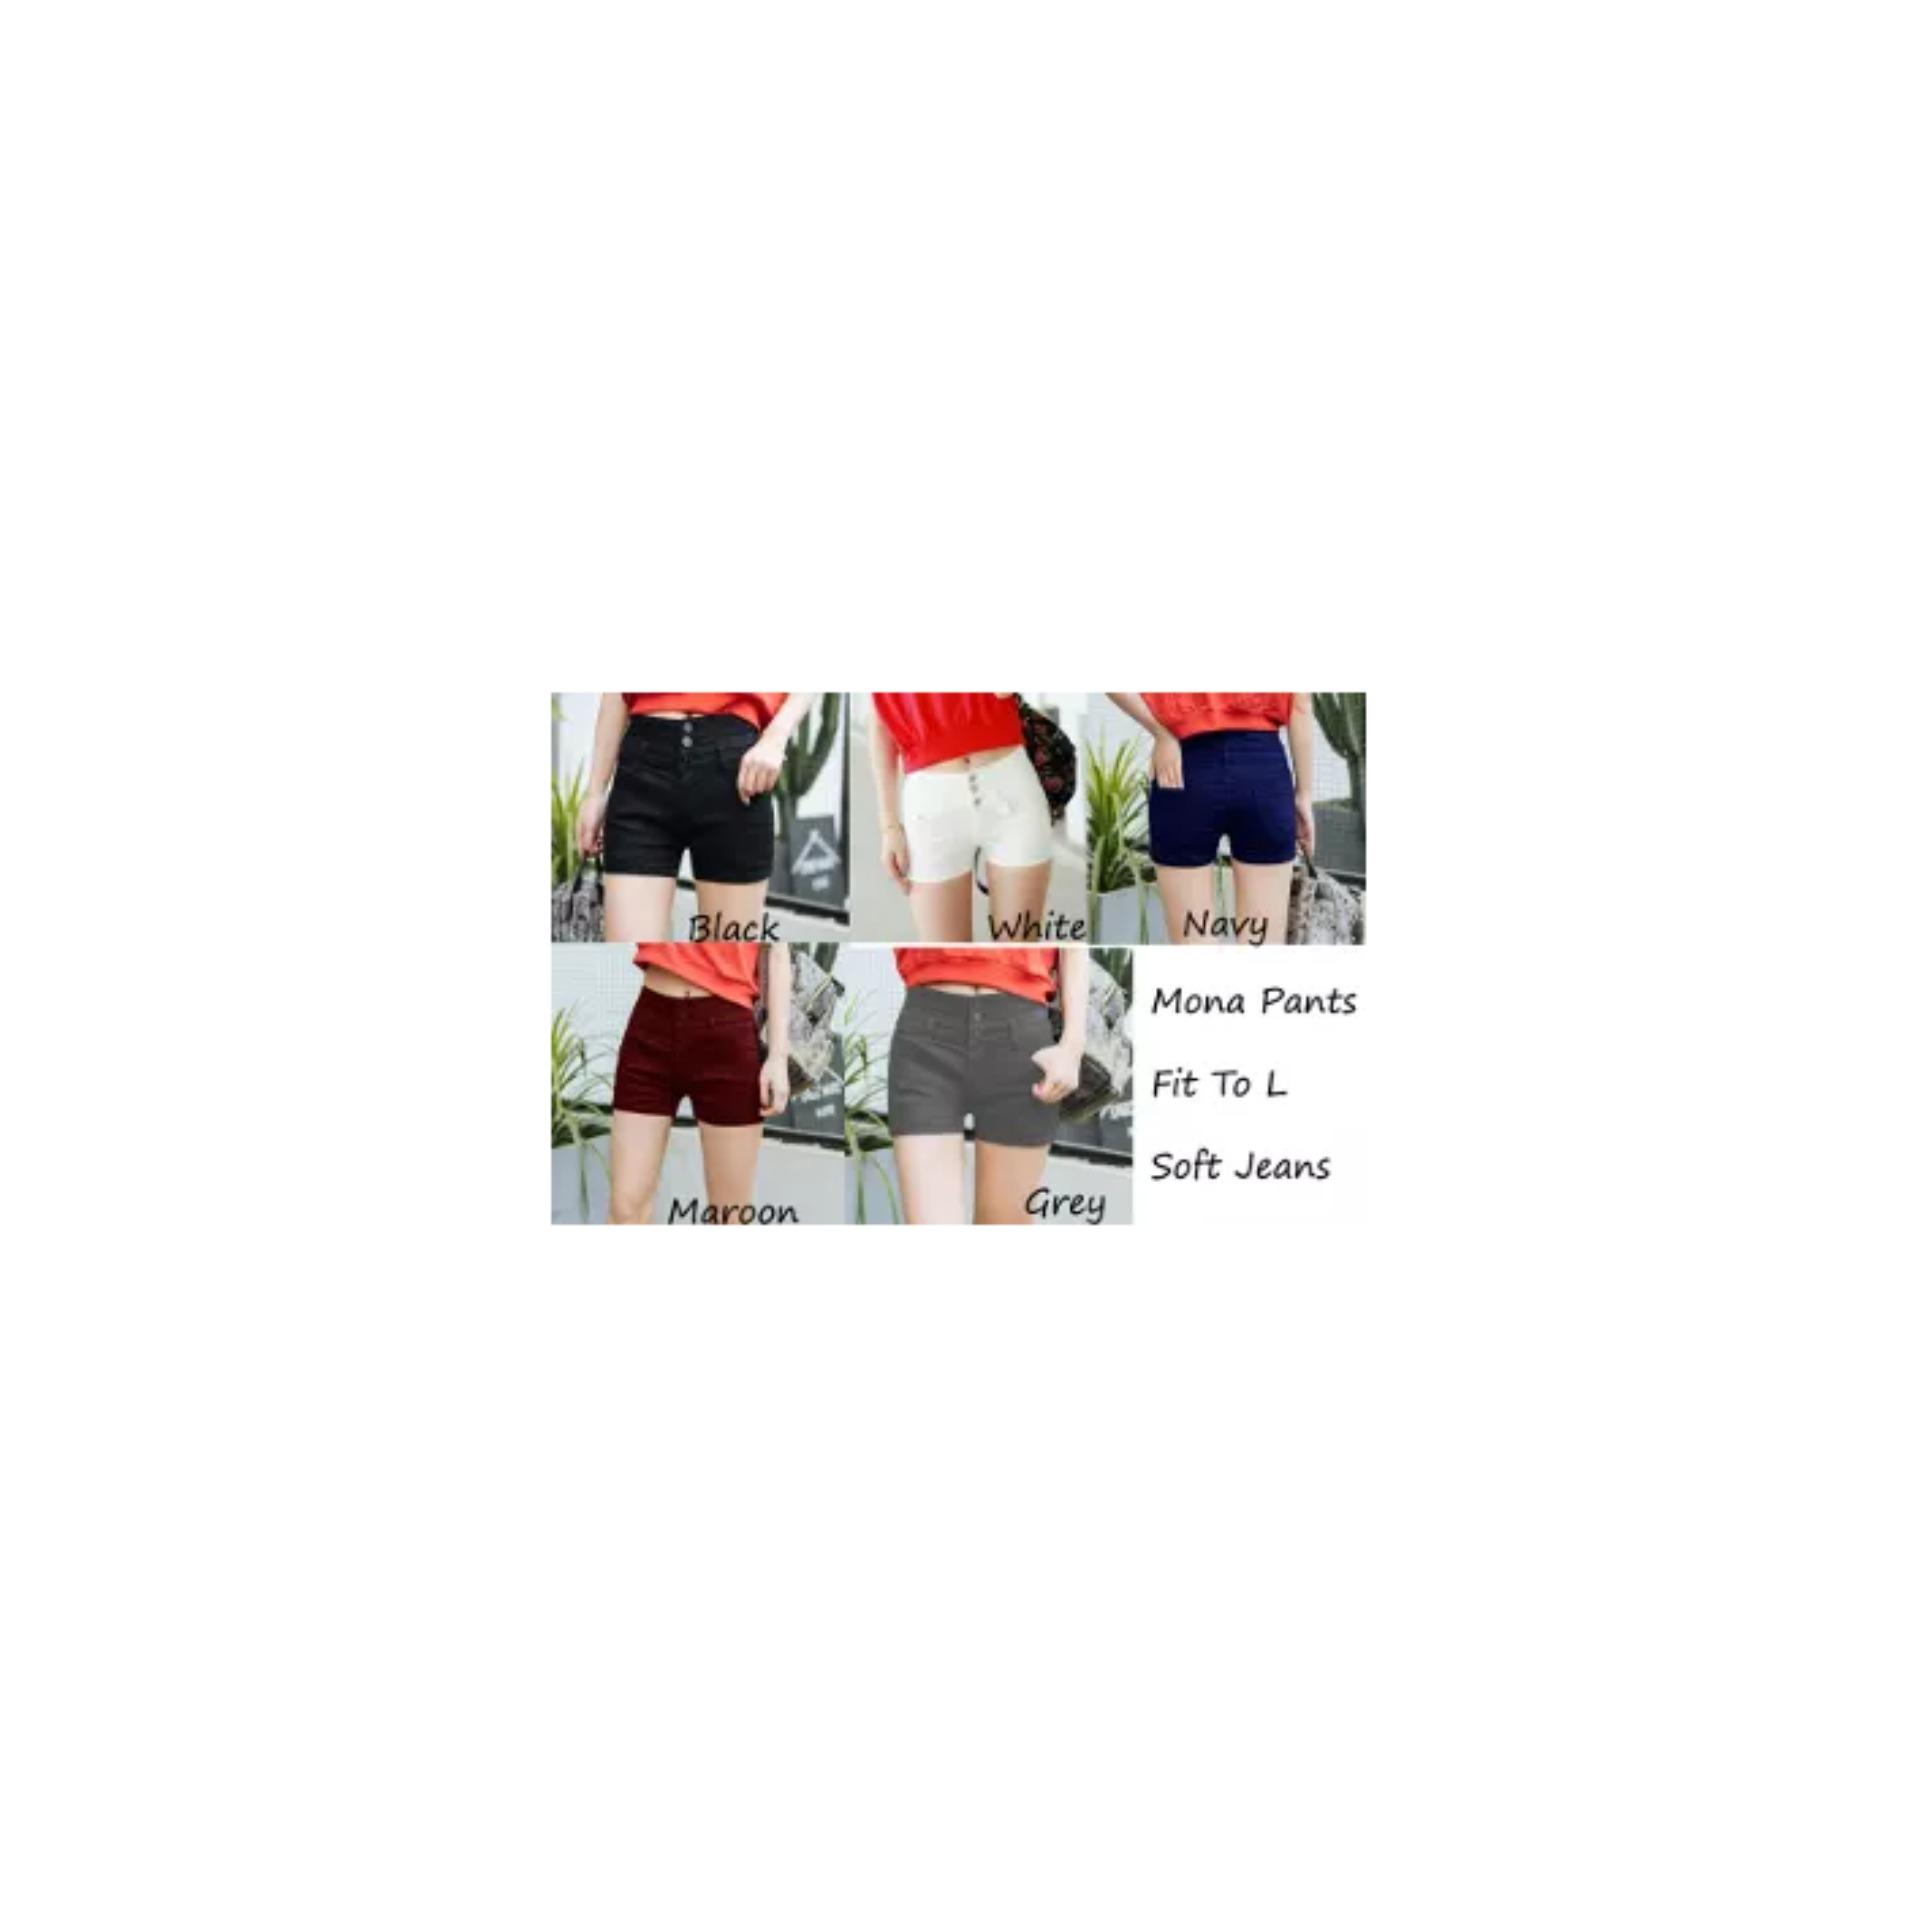 Buy Sell Cheapest Promo Mona Shortpants Best Quality Product Deals Nike Pro Combat Shortpant Celana Pendek Ketat Wanita Bawahan Hot Pants